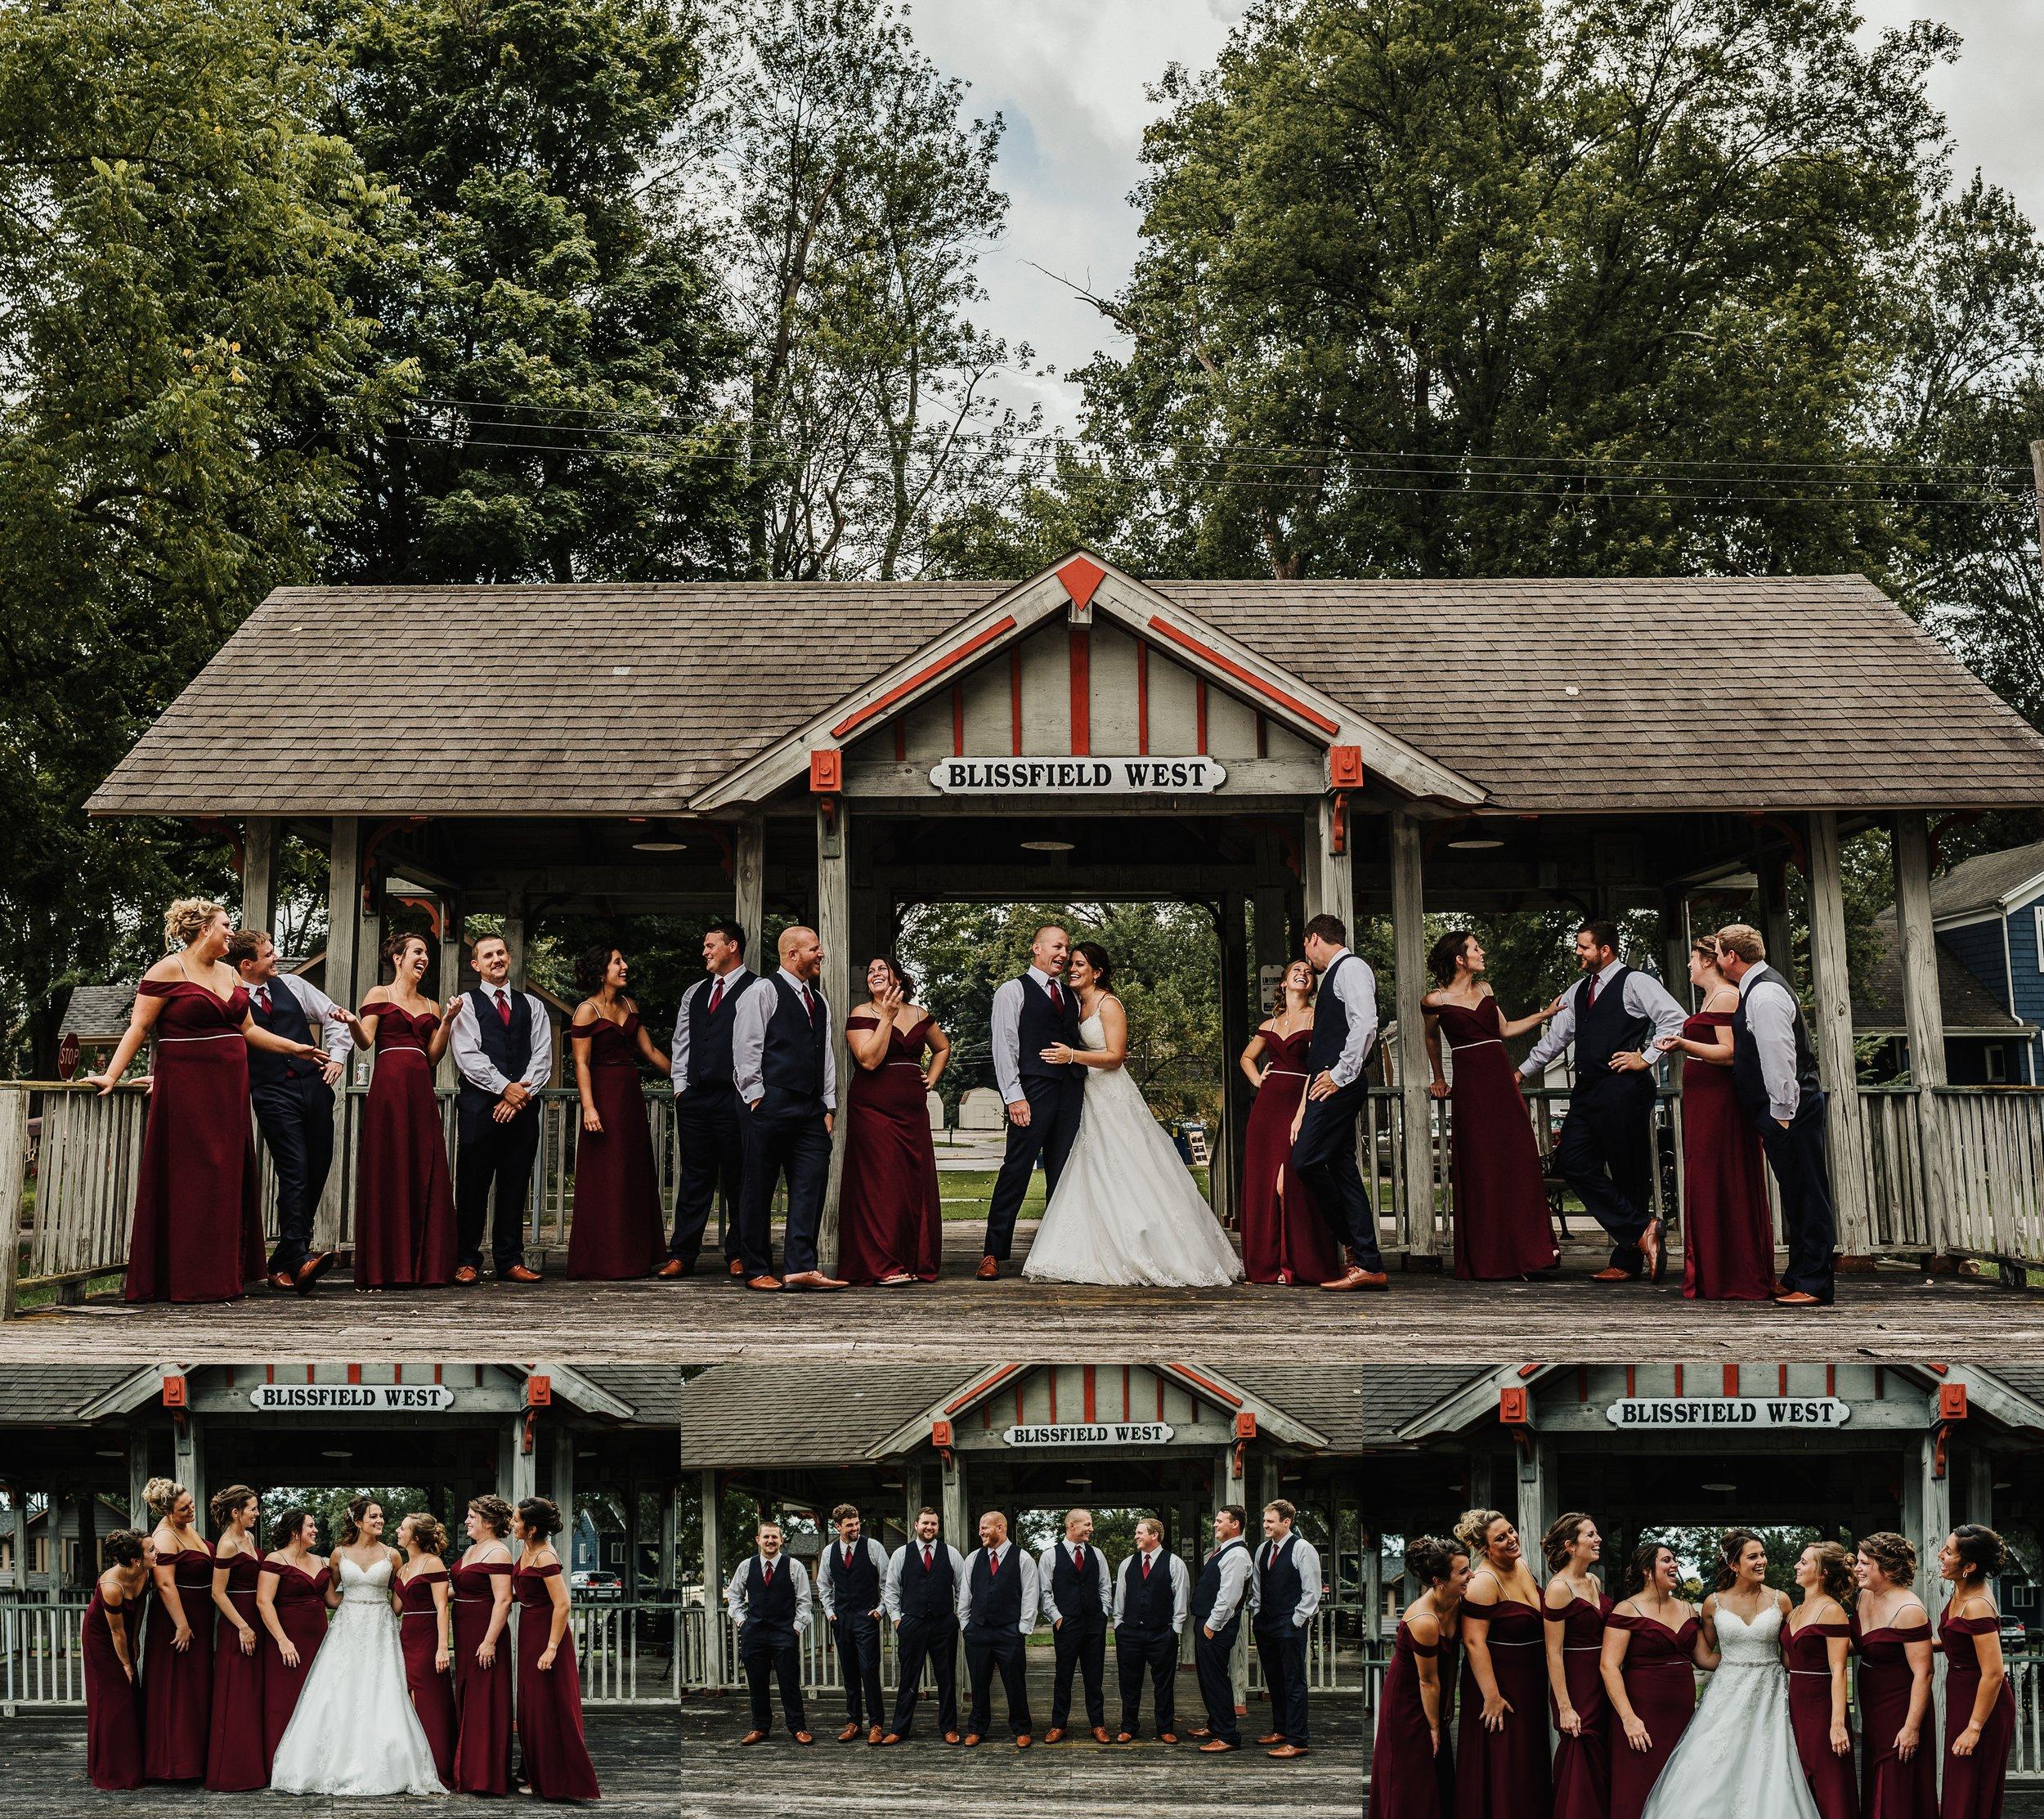 Wedding party at train depot